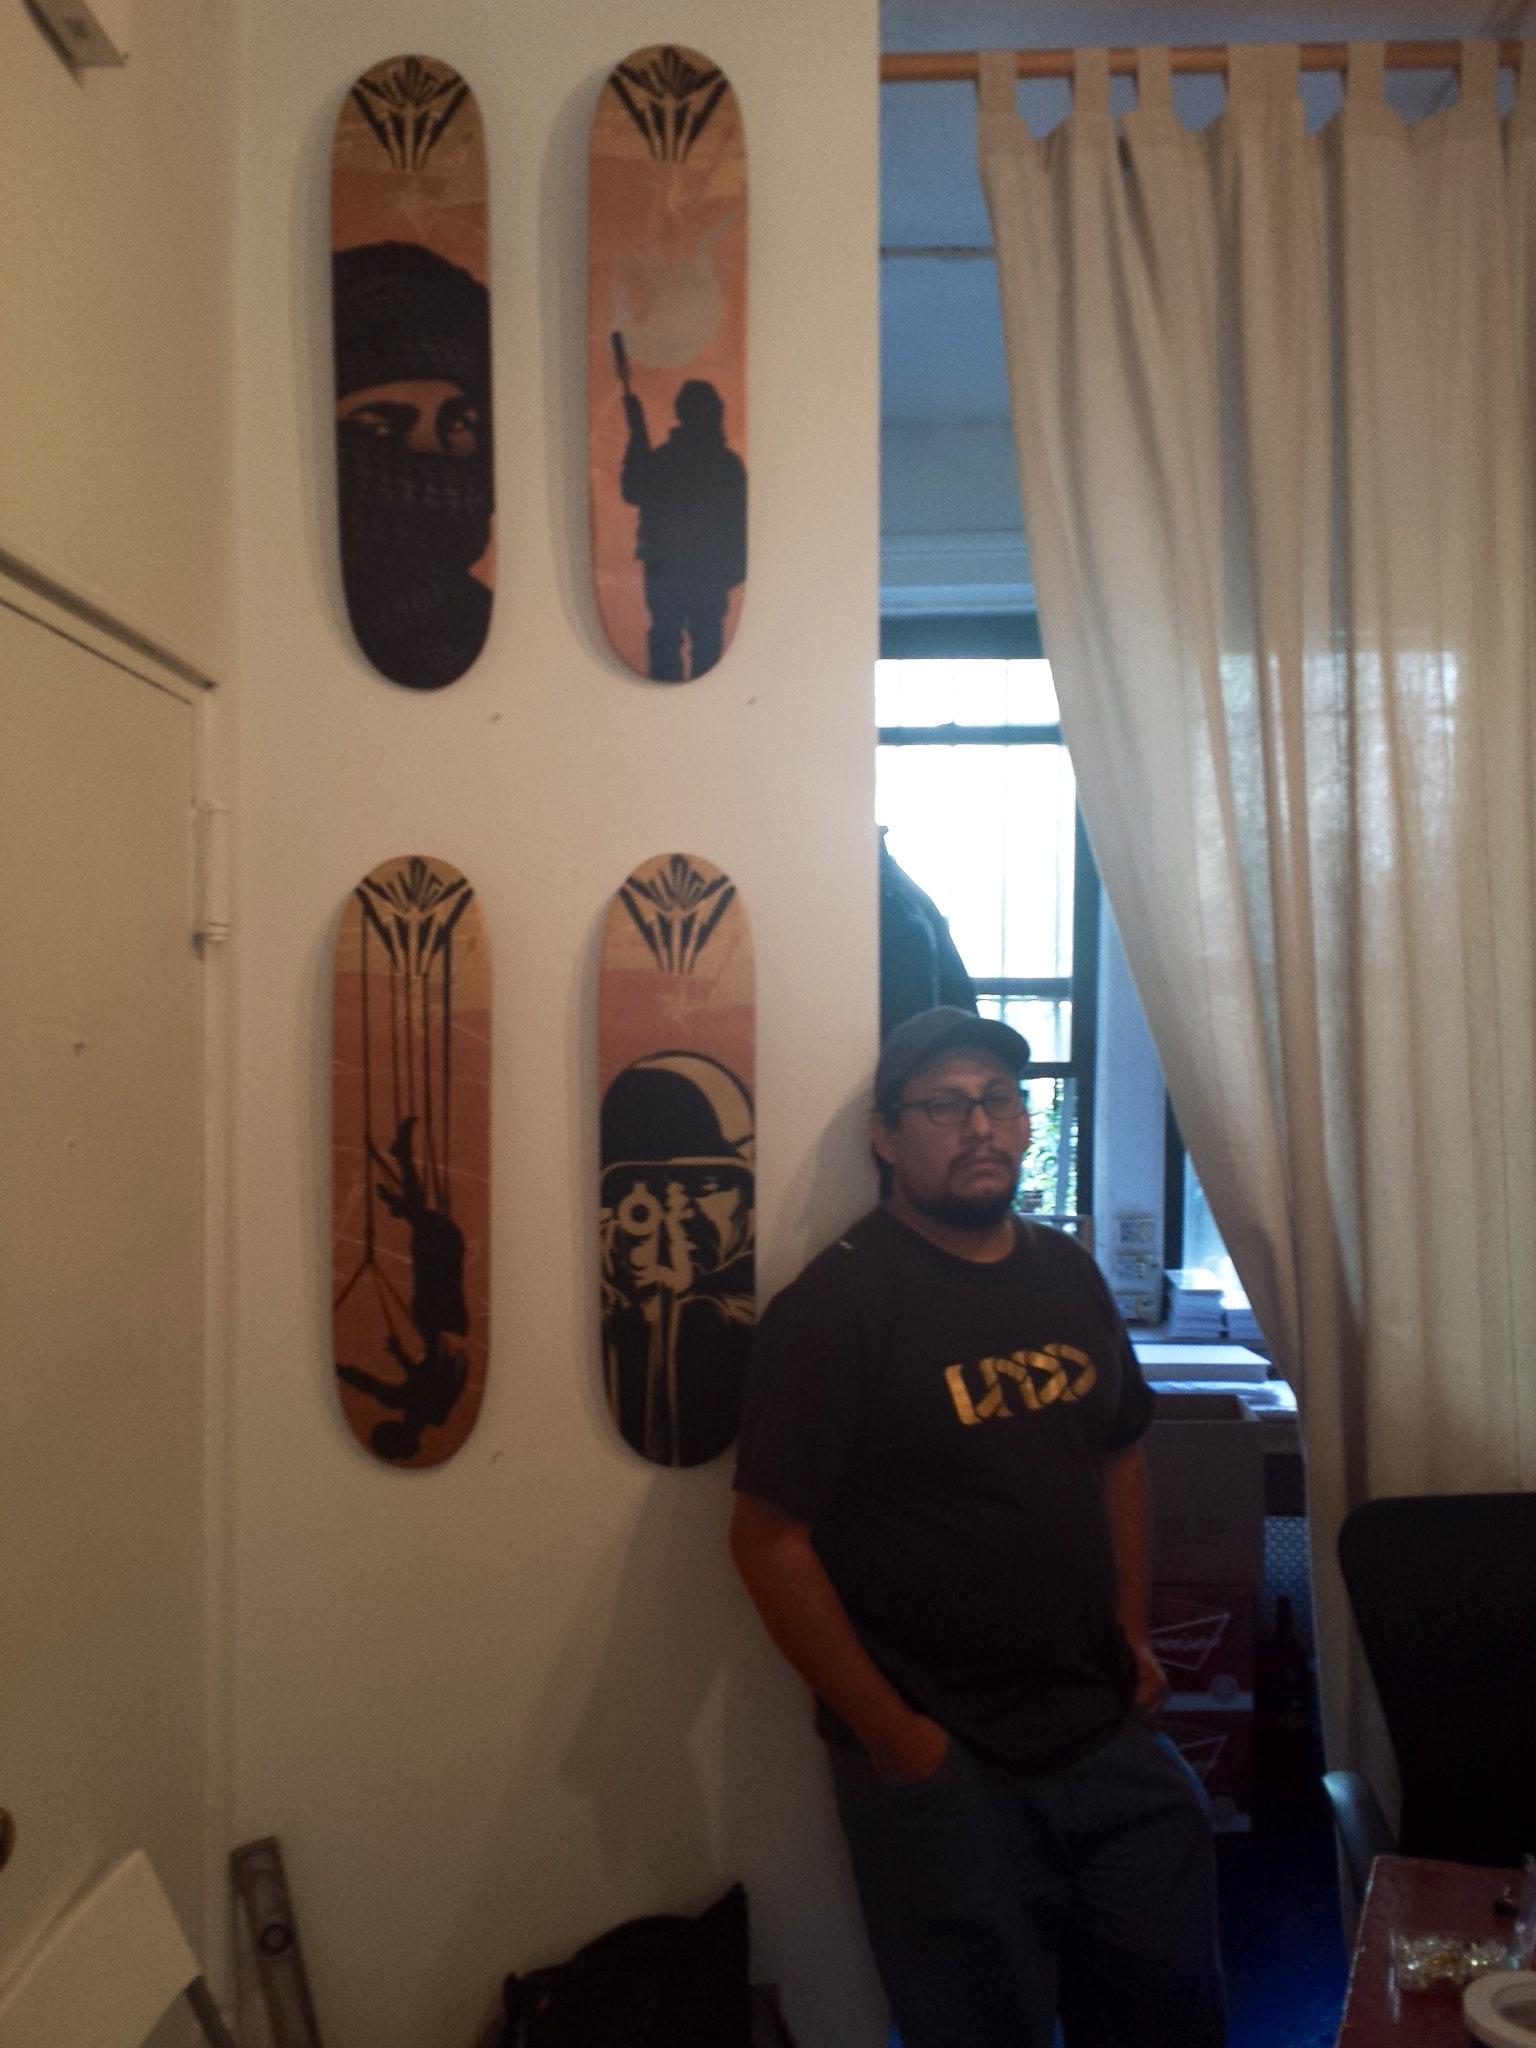 Undo in front of his Designer Skate Boards